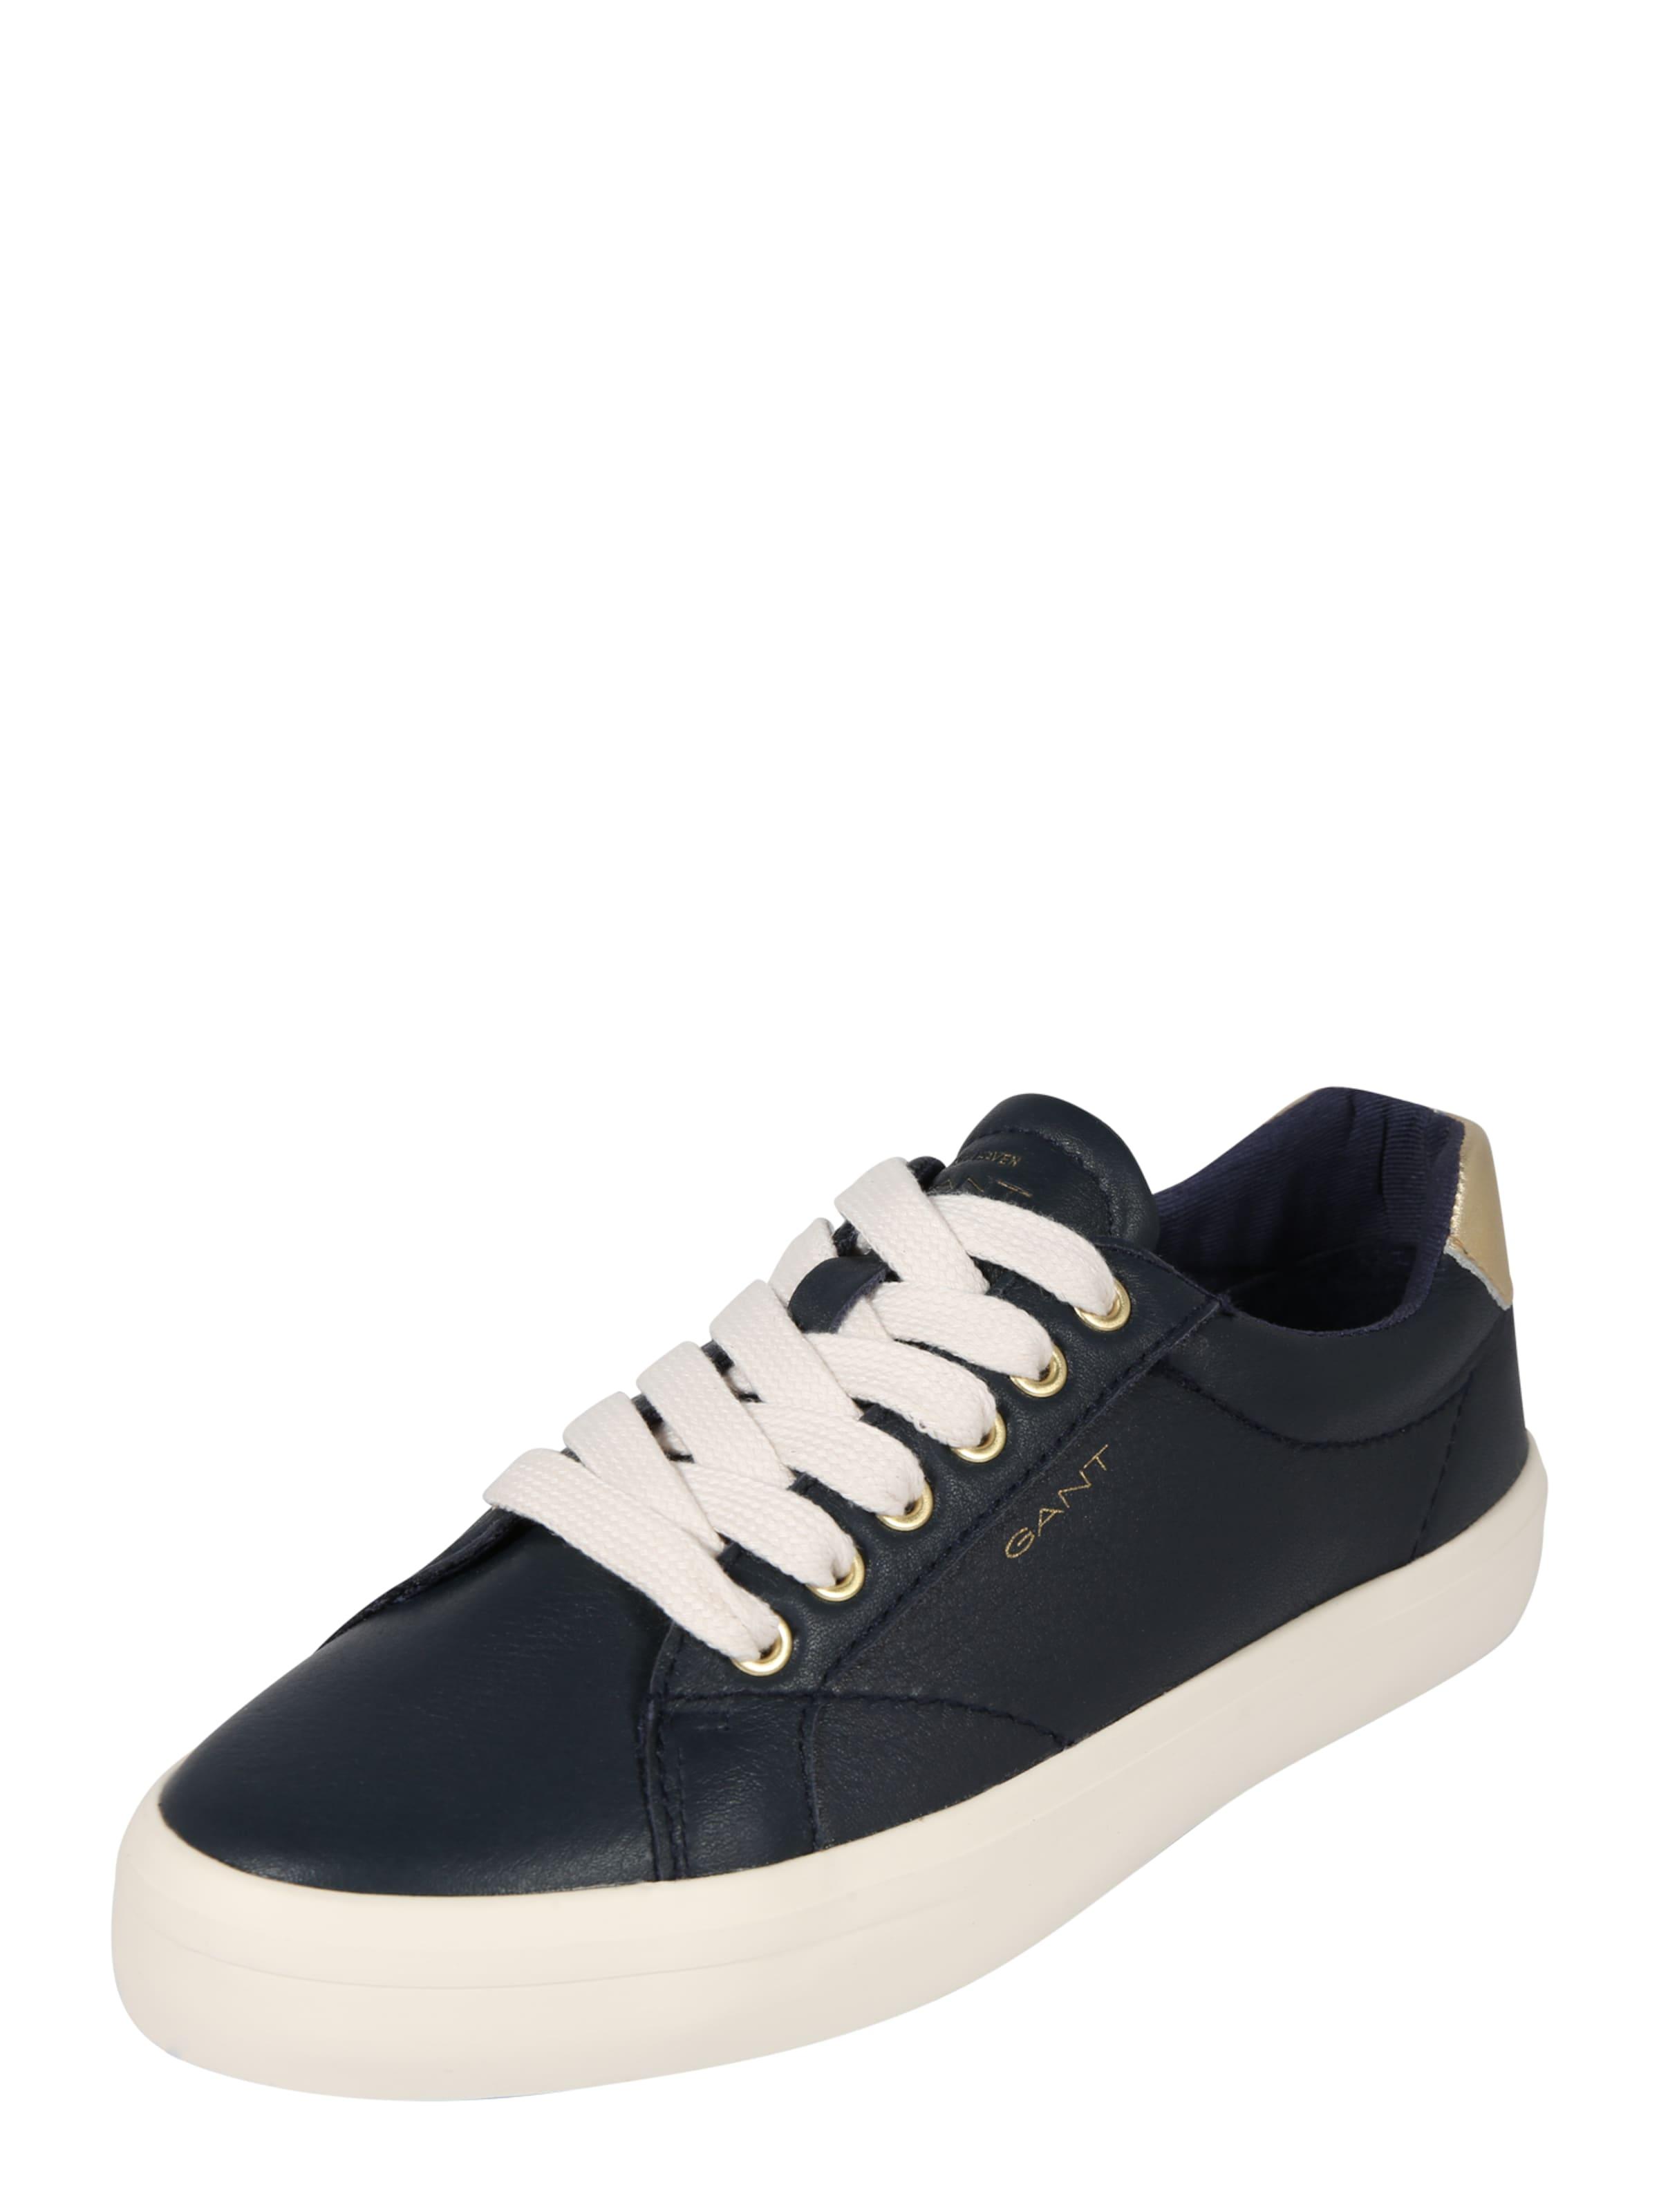 'baltimore' Gant Weiß Gant Sneaker In Sneaker CrxBdeo